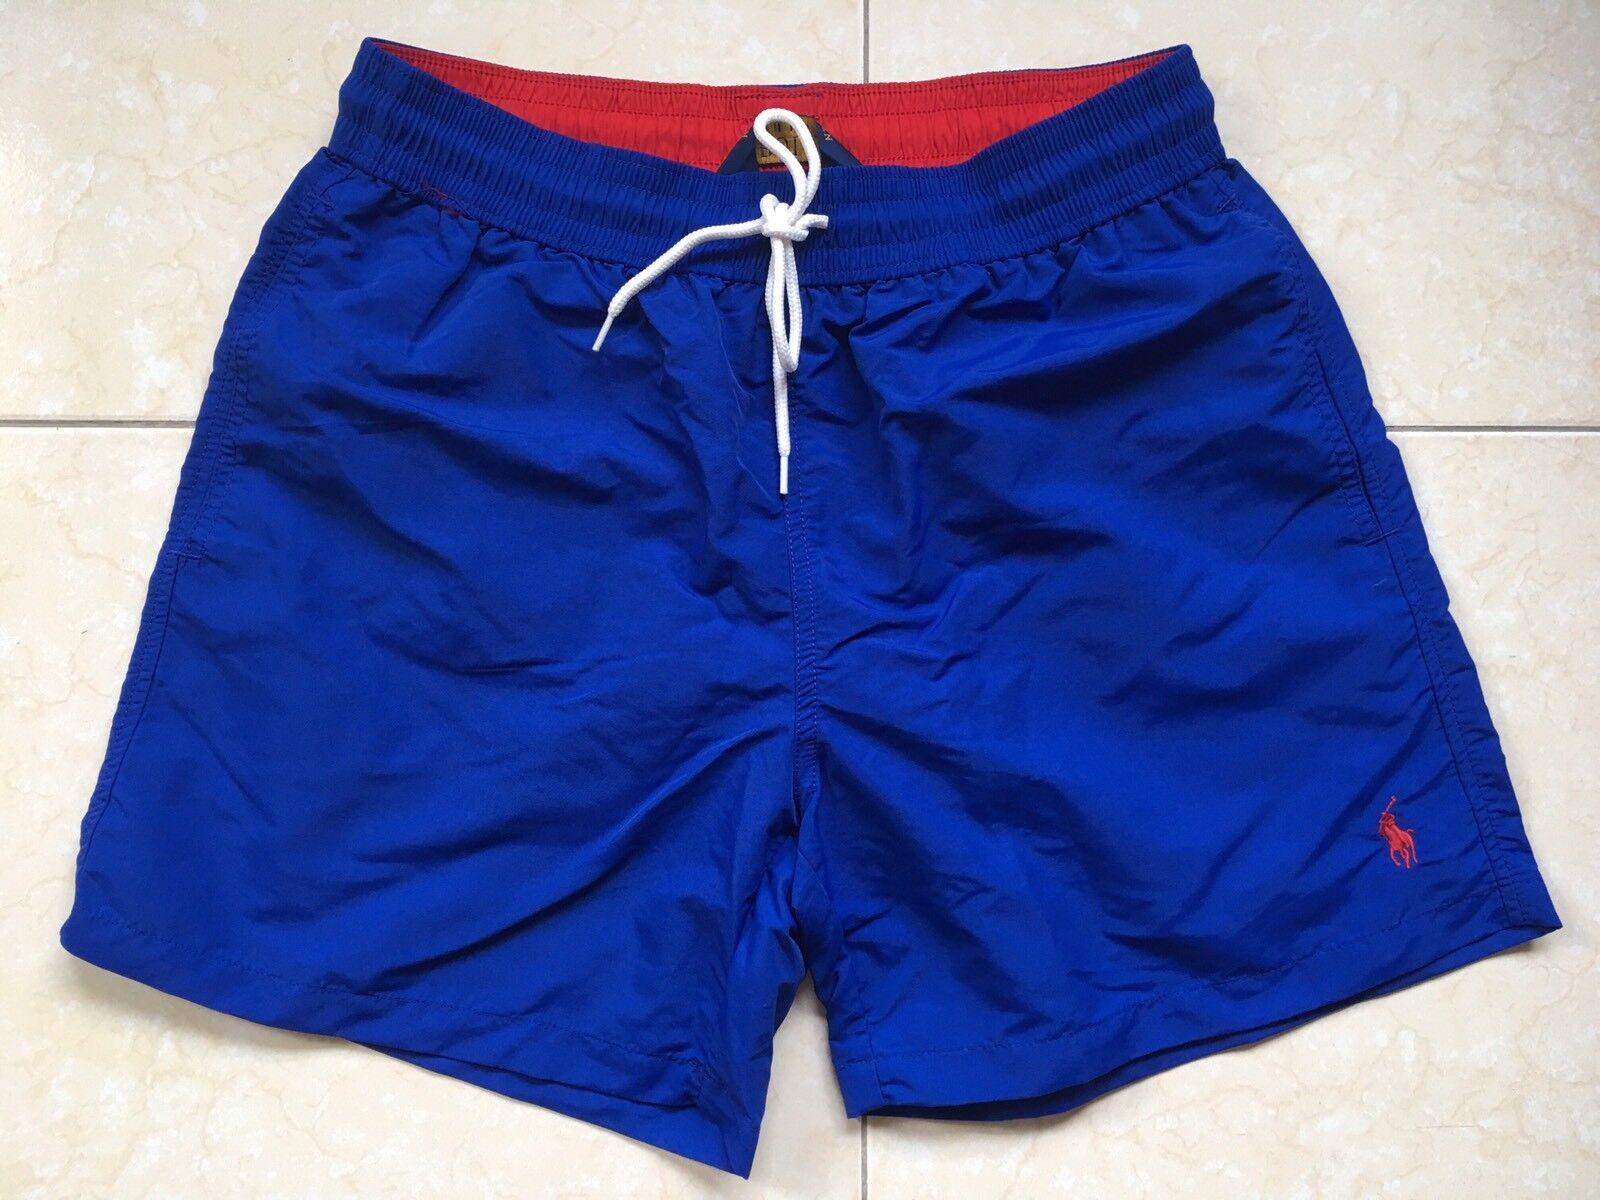 Polo Ralph Lauren Swim Shorts Traveler Trunk Royal bluee Side S ,M